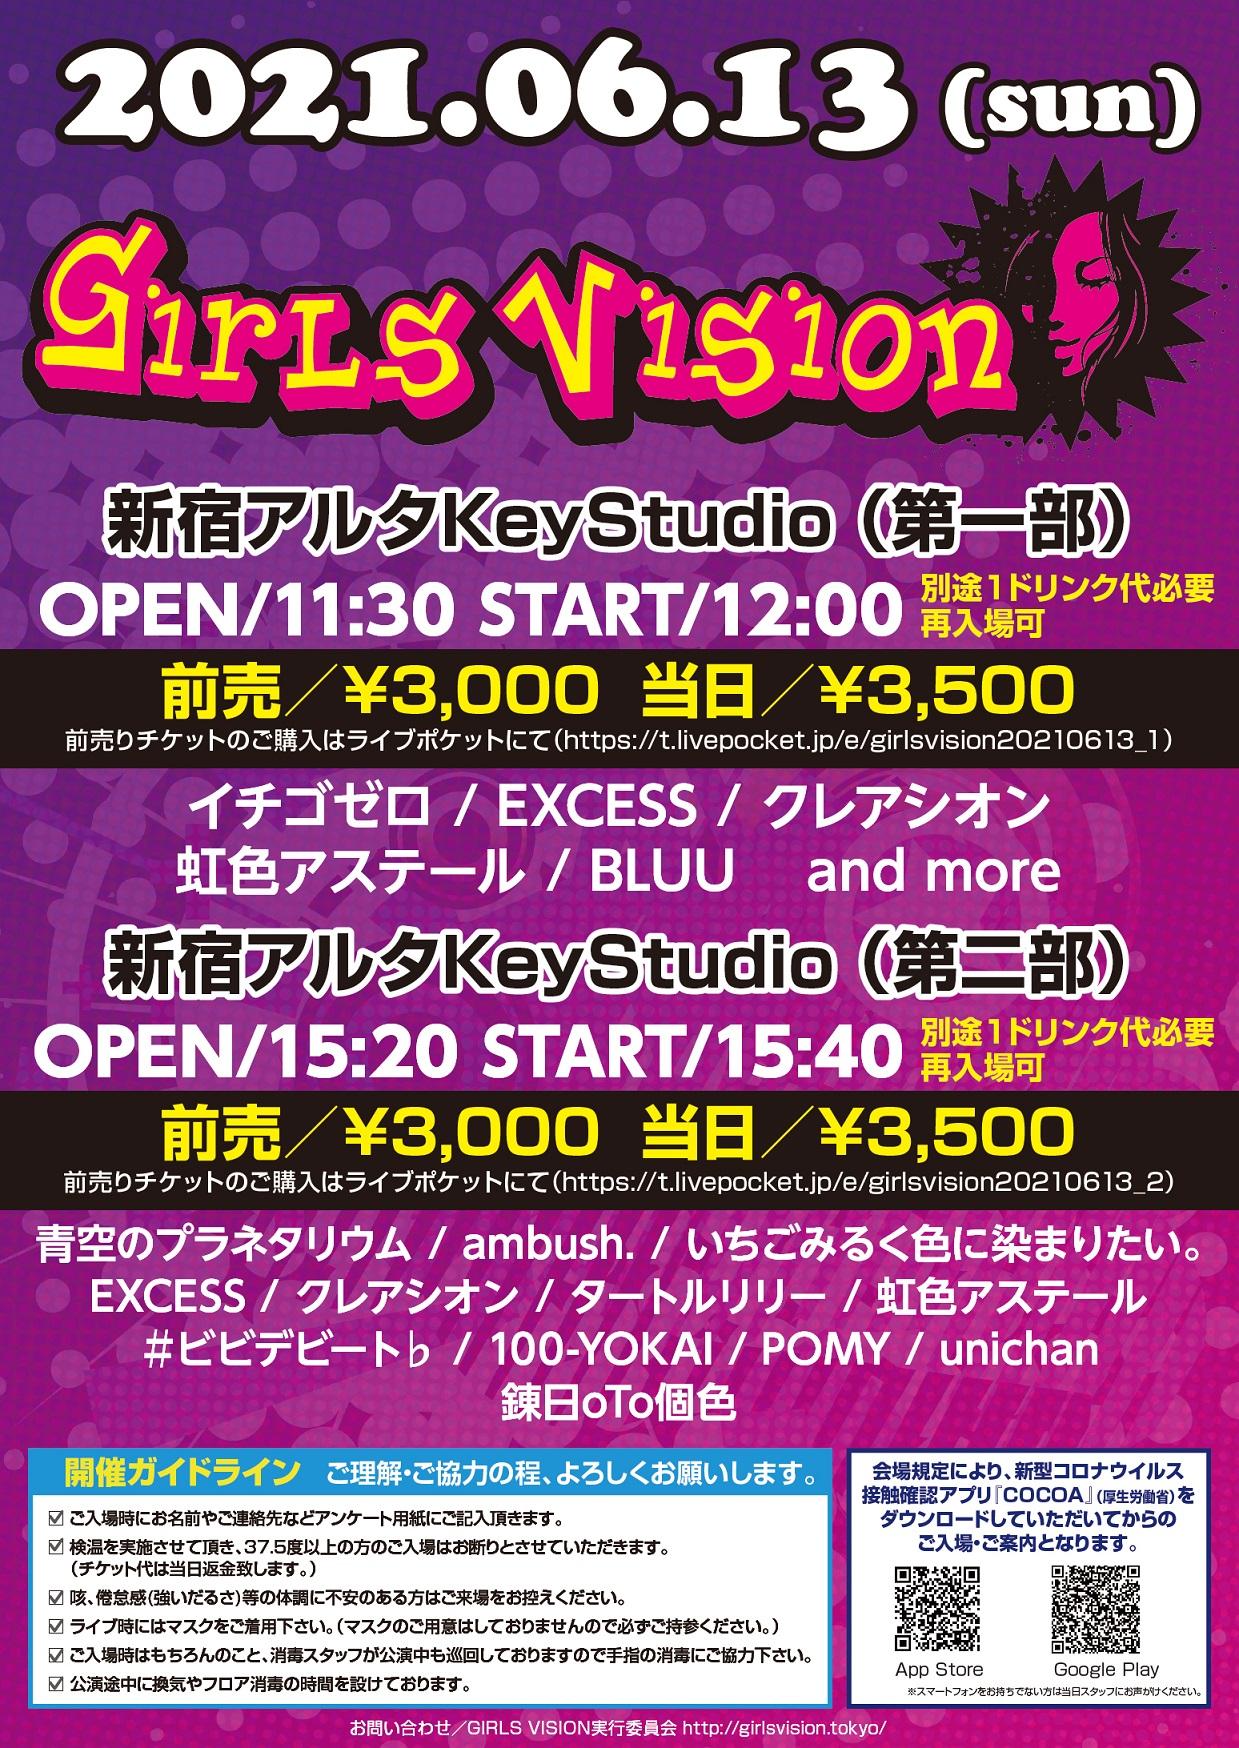 GIRLS VISION@新宿アルタKeyStudio(第二部)